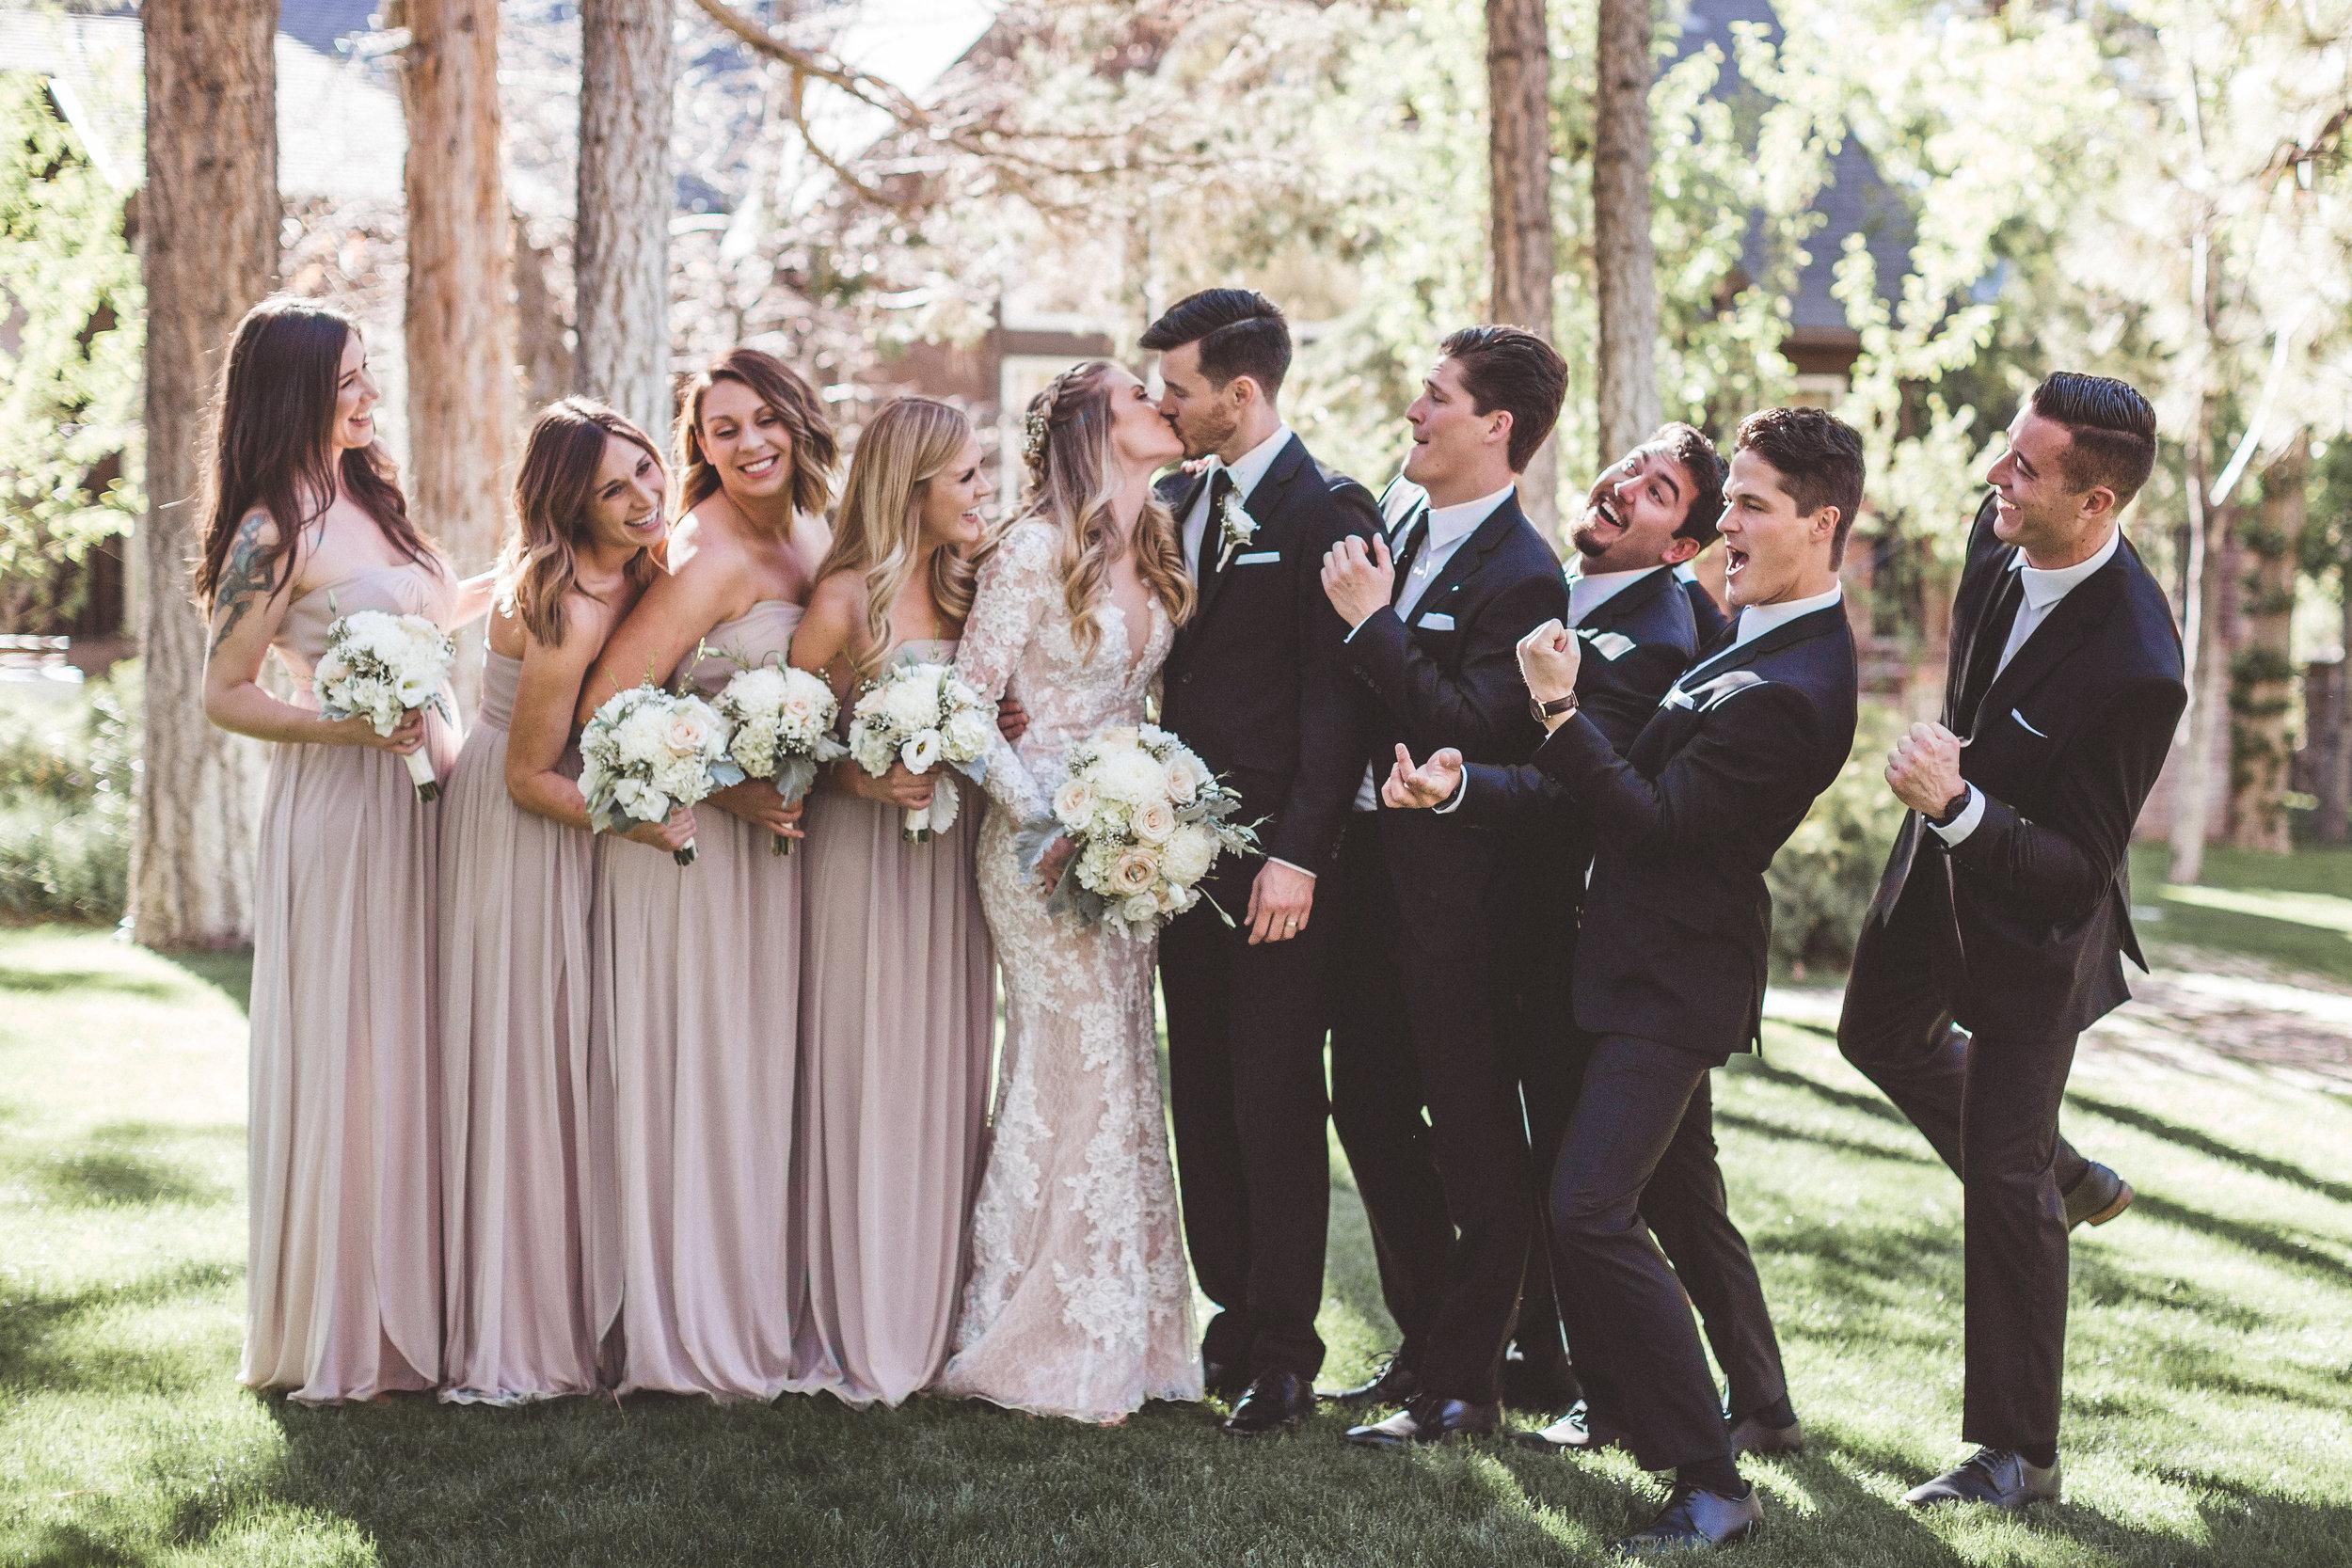 jill-and-alexs-intimates-big-bear-wedding25.jpg